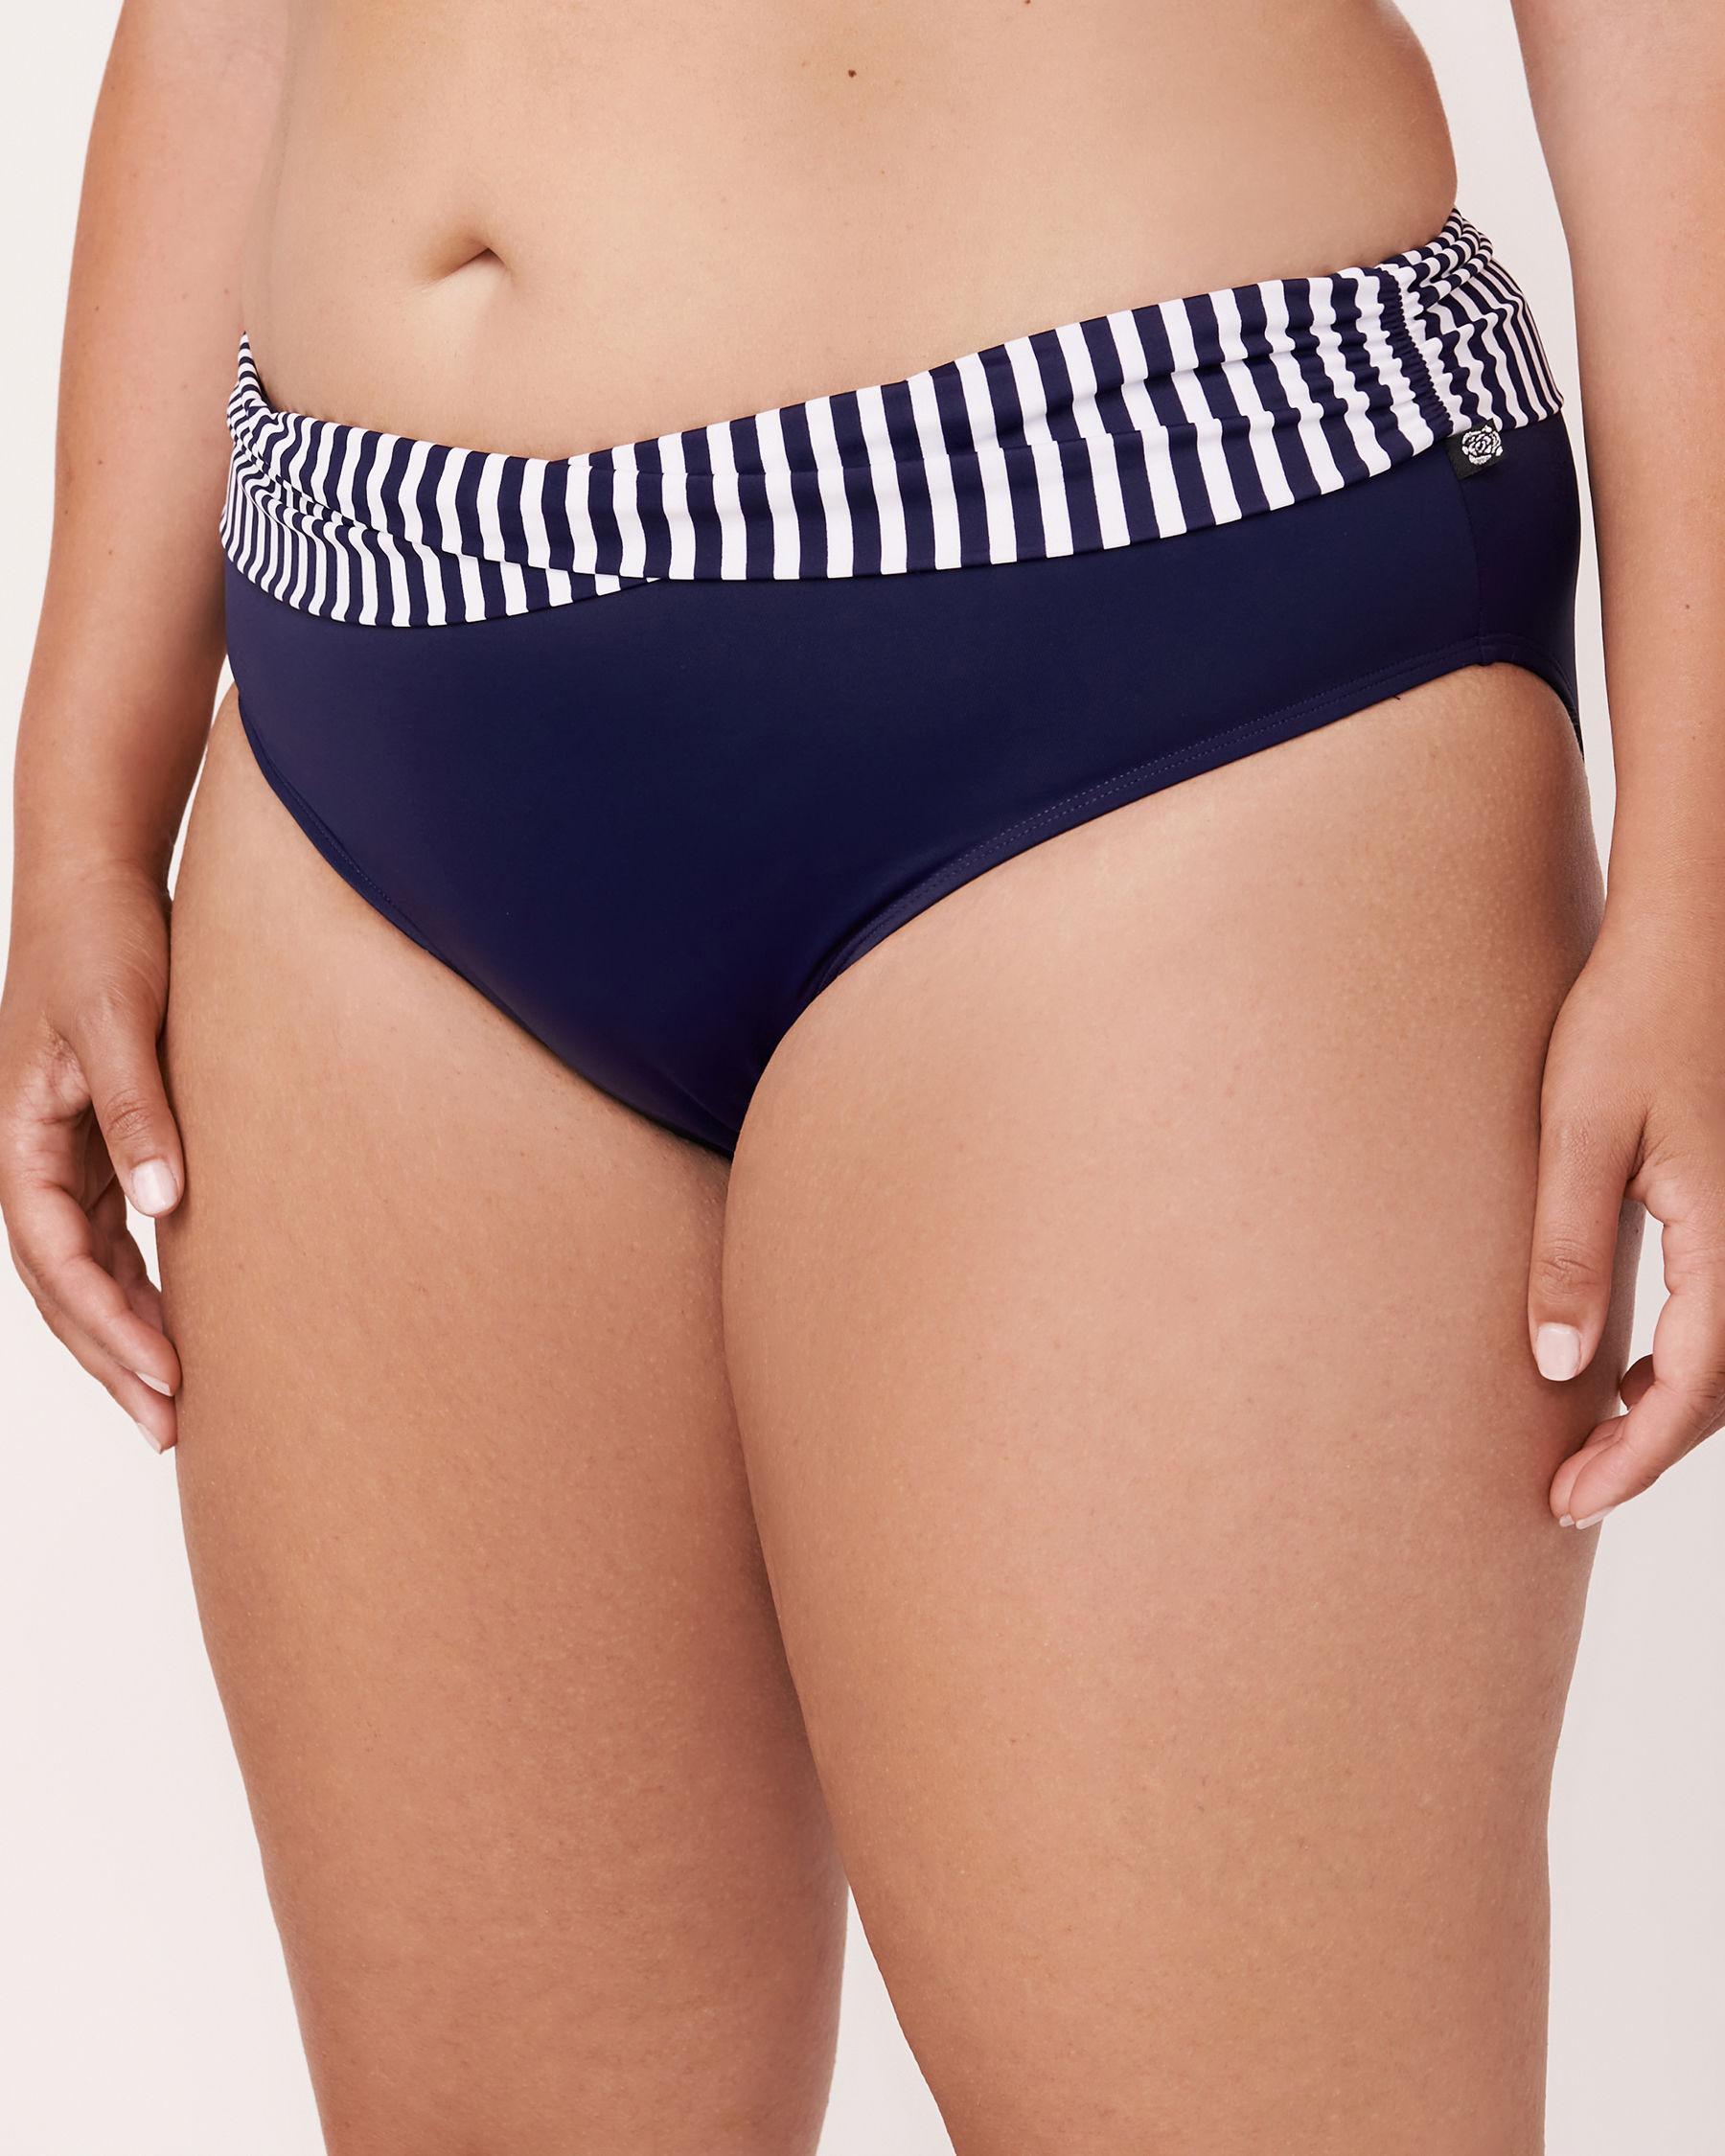 LA VIE EN ROSE AQUA COSMO Twisted Waistband Bikini Bottom Blue 671-691-0-0P - View1